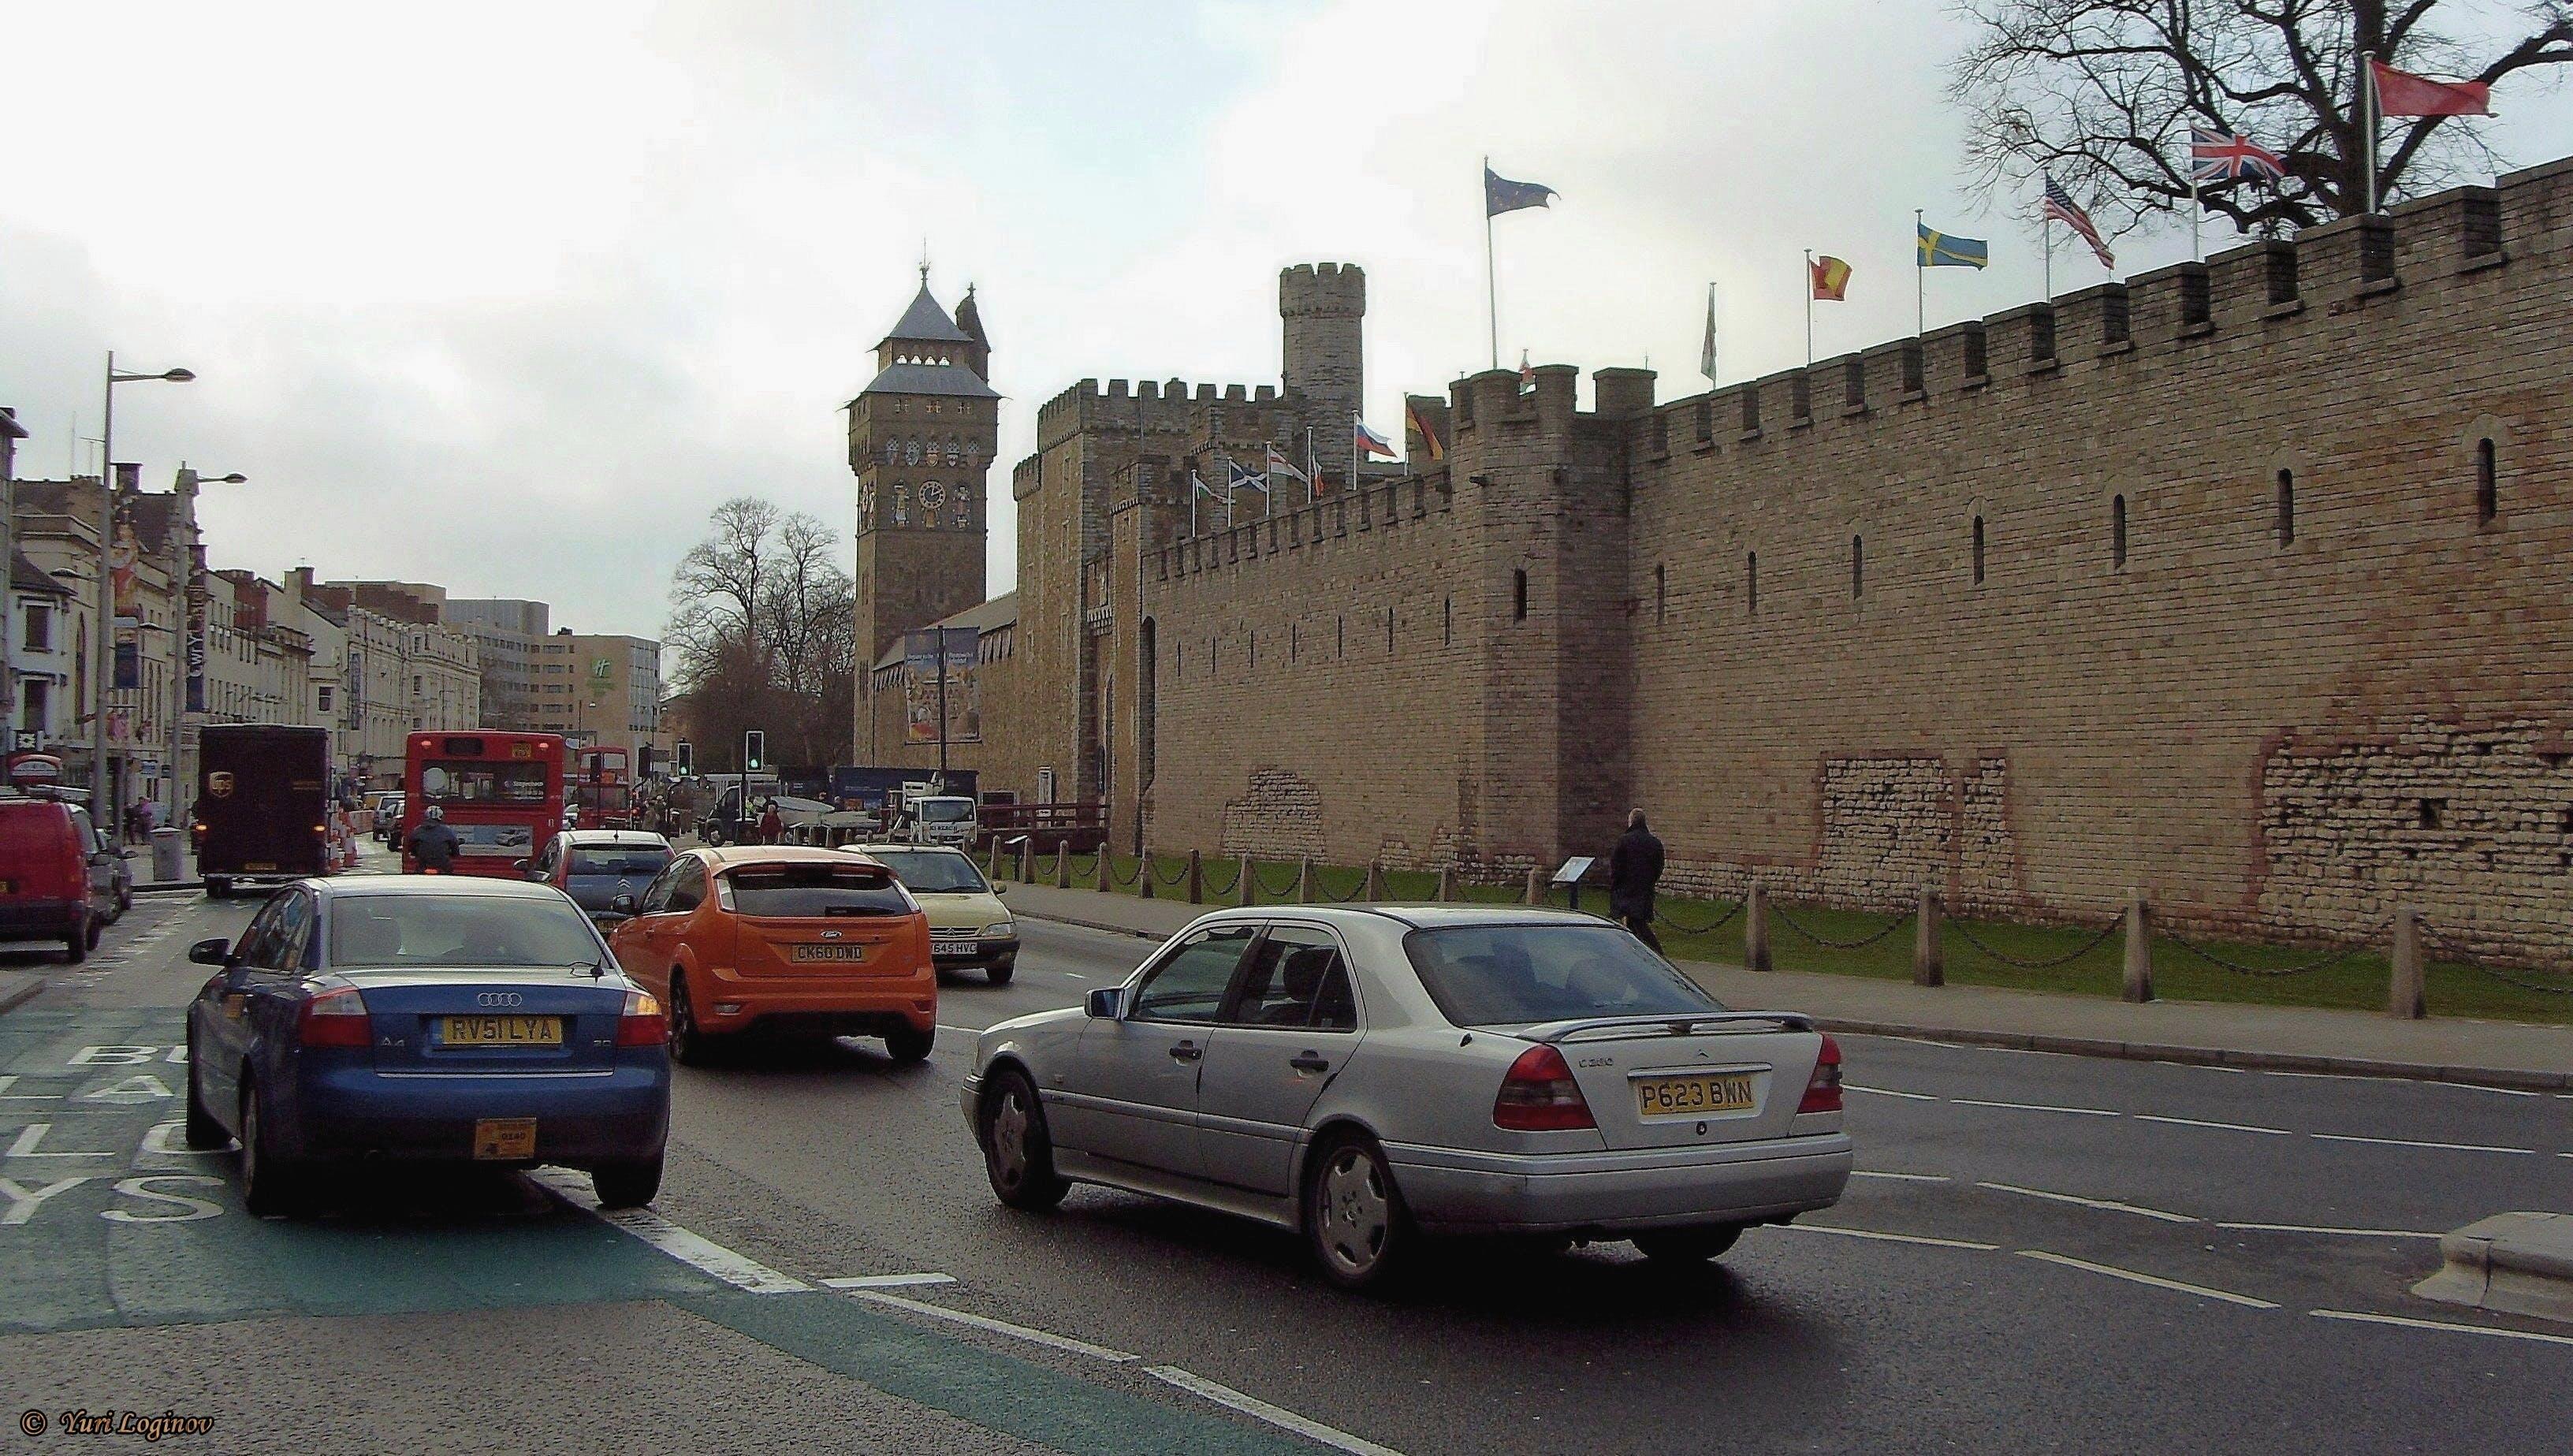 Free stock photo of Wales, united kingdom, cardiff, Cardiff Castle